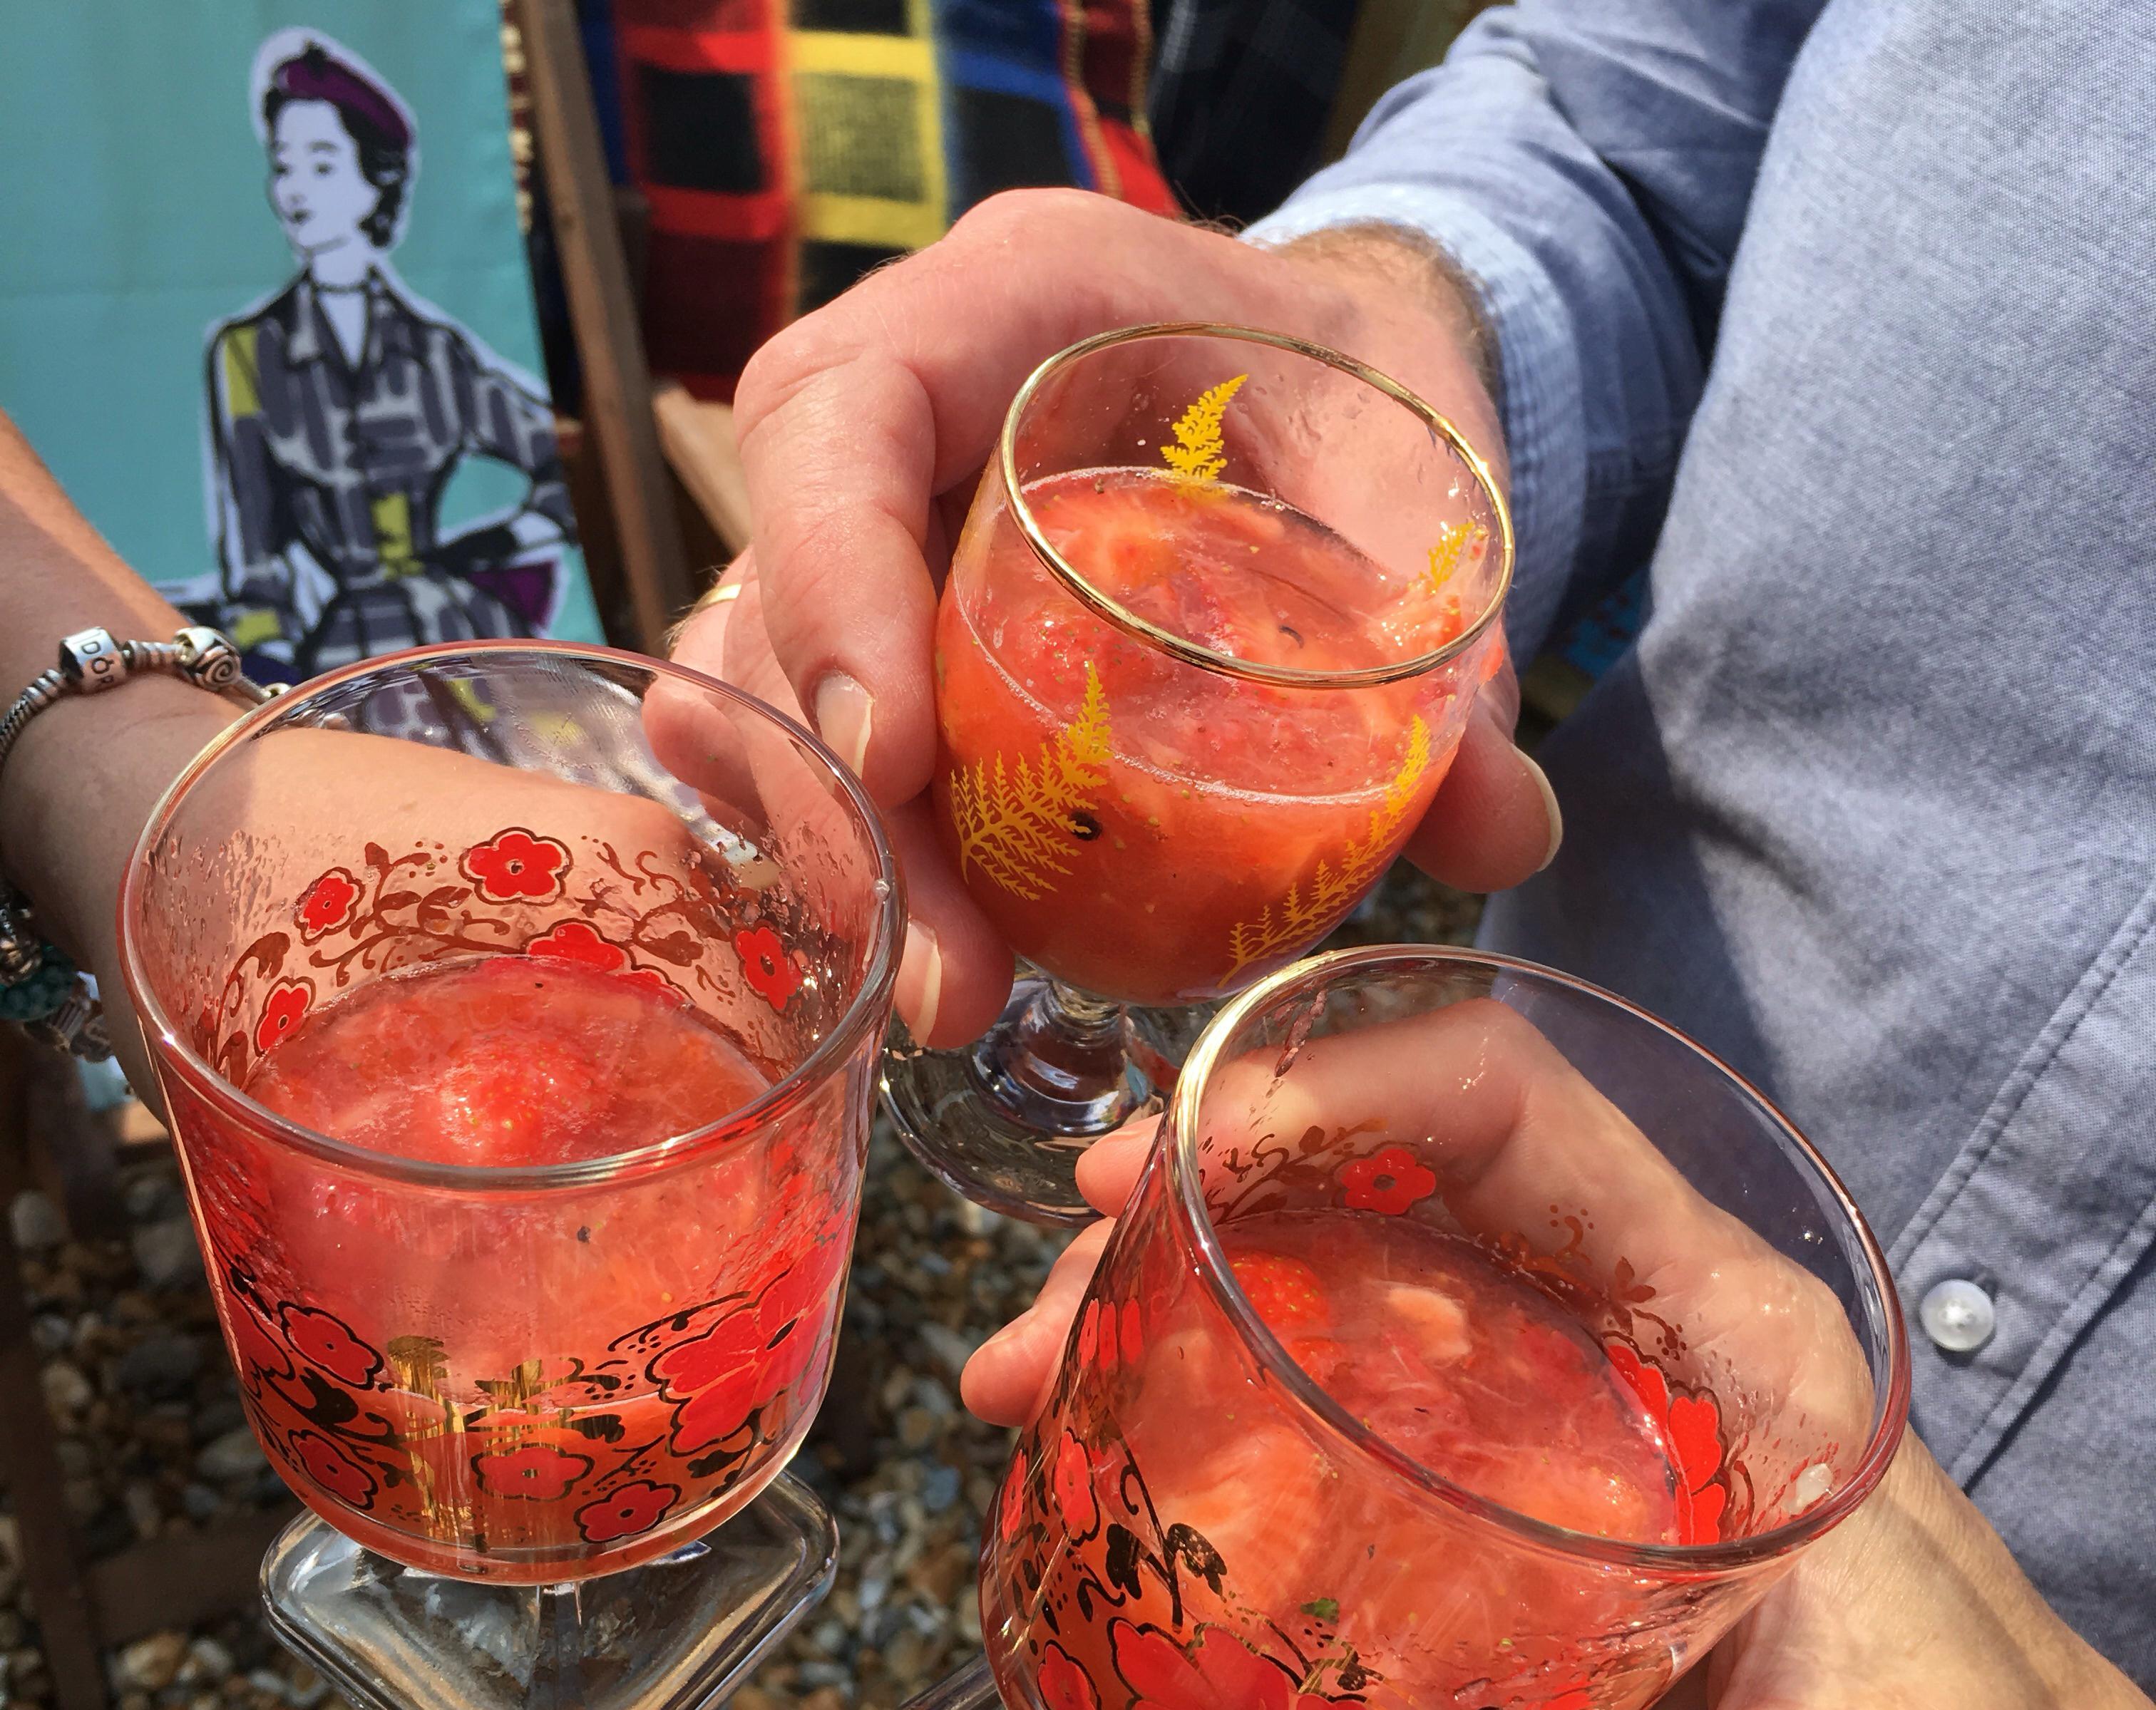 Beachhutcook's Strawberry, Vanilla and Black Pepper Daiquiri Cocktail